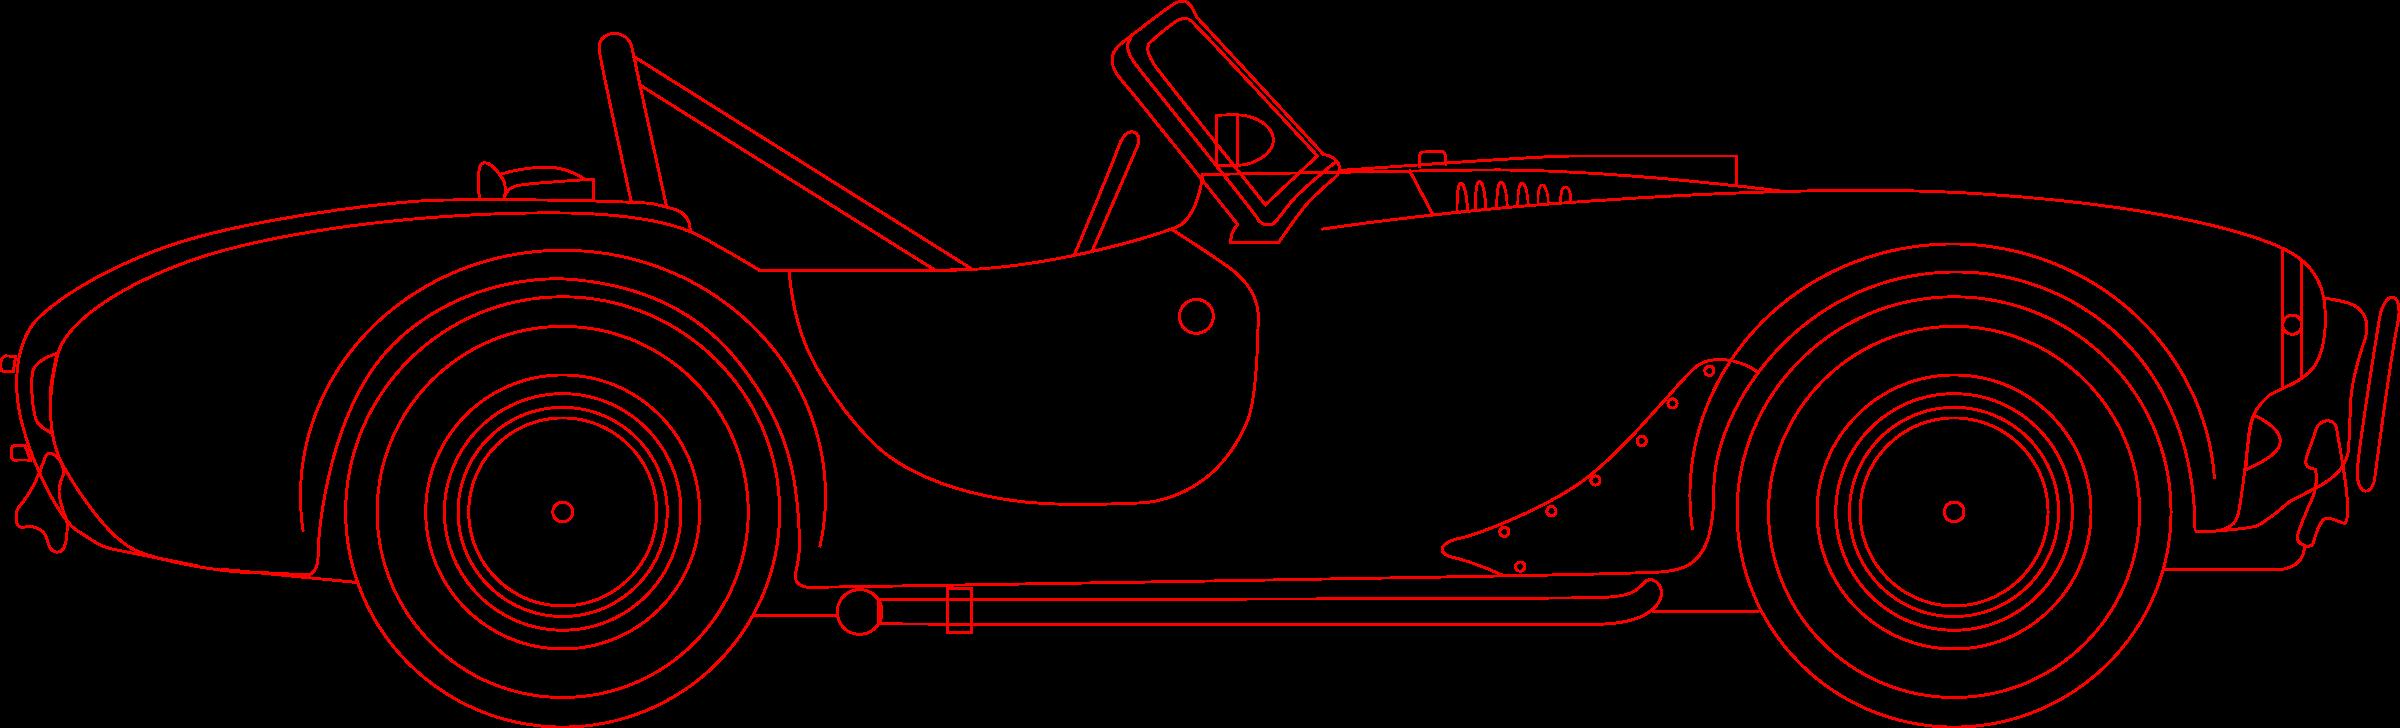 Blueprint big image png. Cobra clipart shelby cobra